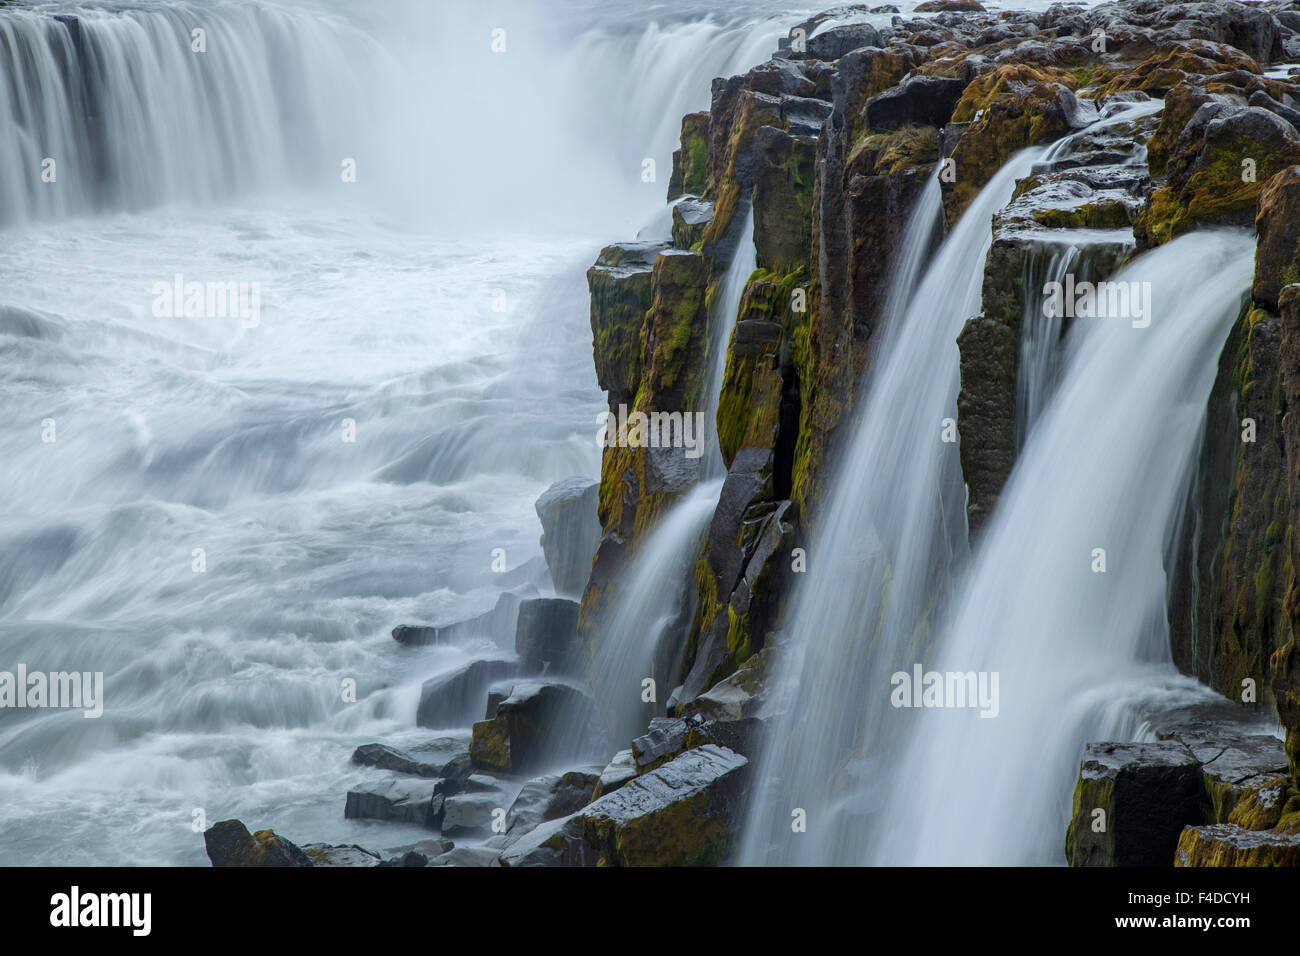 Los acantilados y cascadas de cascada Godafoss, Nordhurland Eystra, Islandia. Imagen De Stock